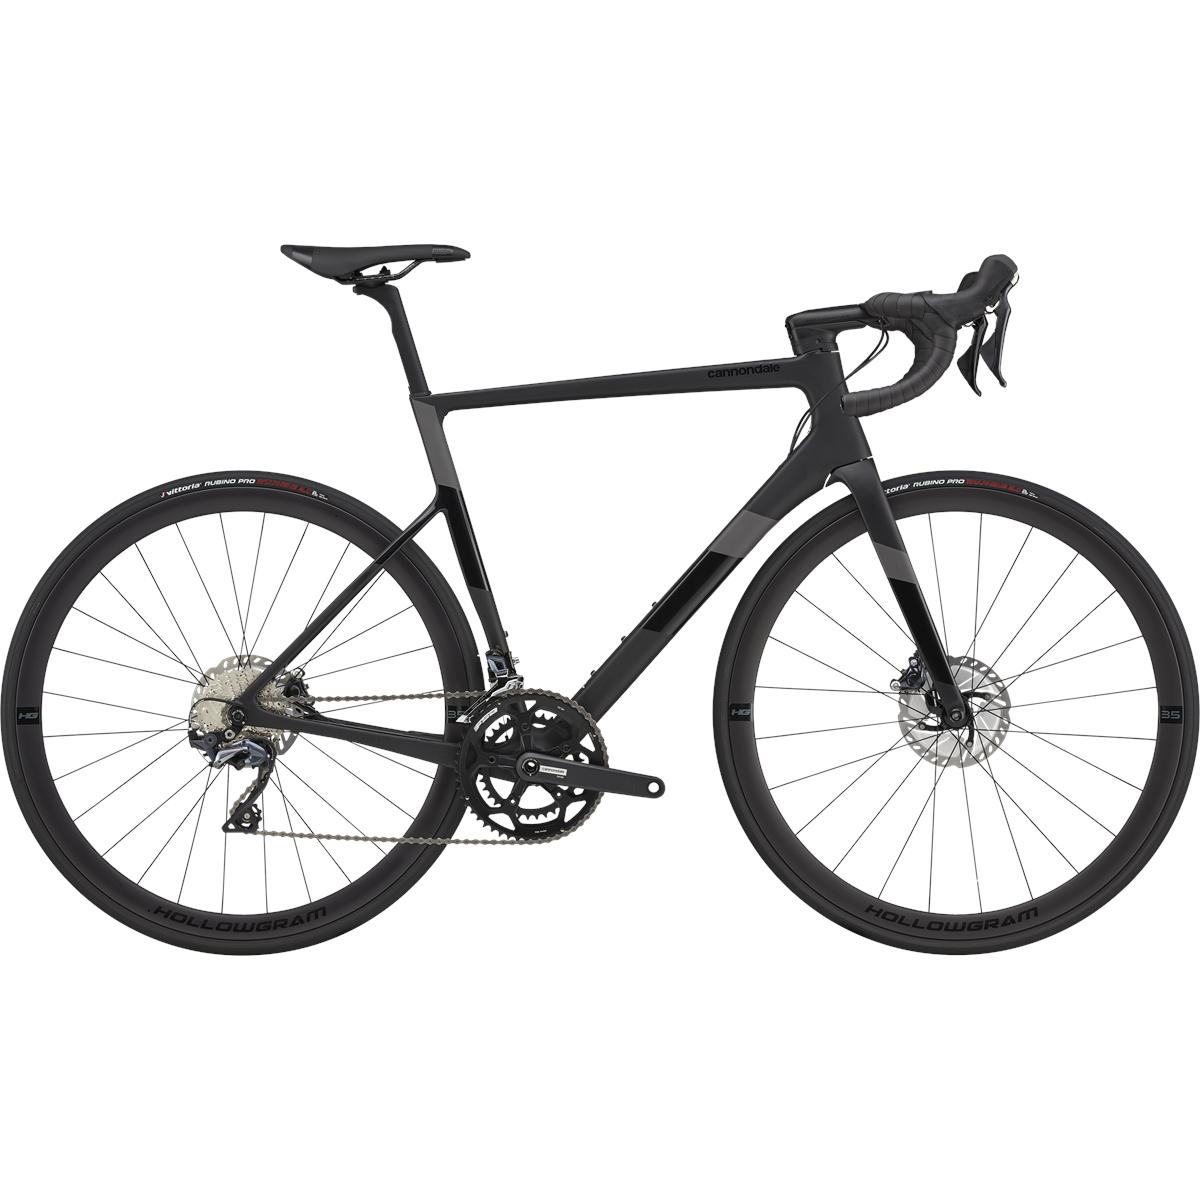 Cannondale SUPERSIX EVO DISC - Ultegra Carbon Rennrad - 2021 - Matte Black